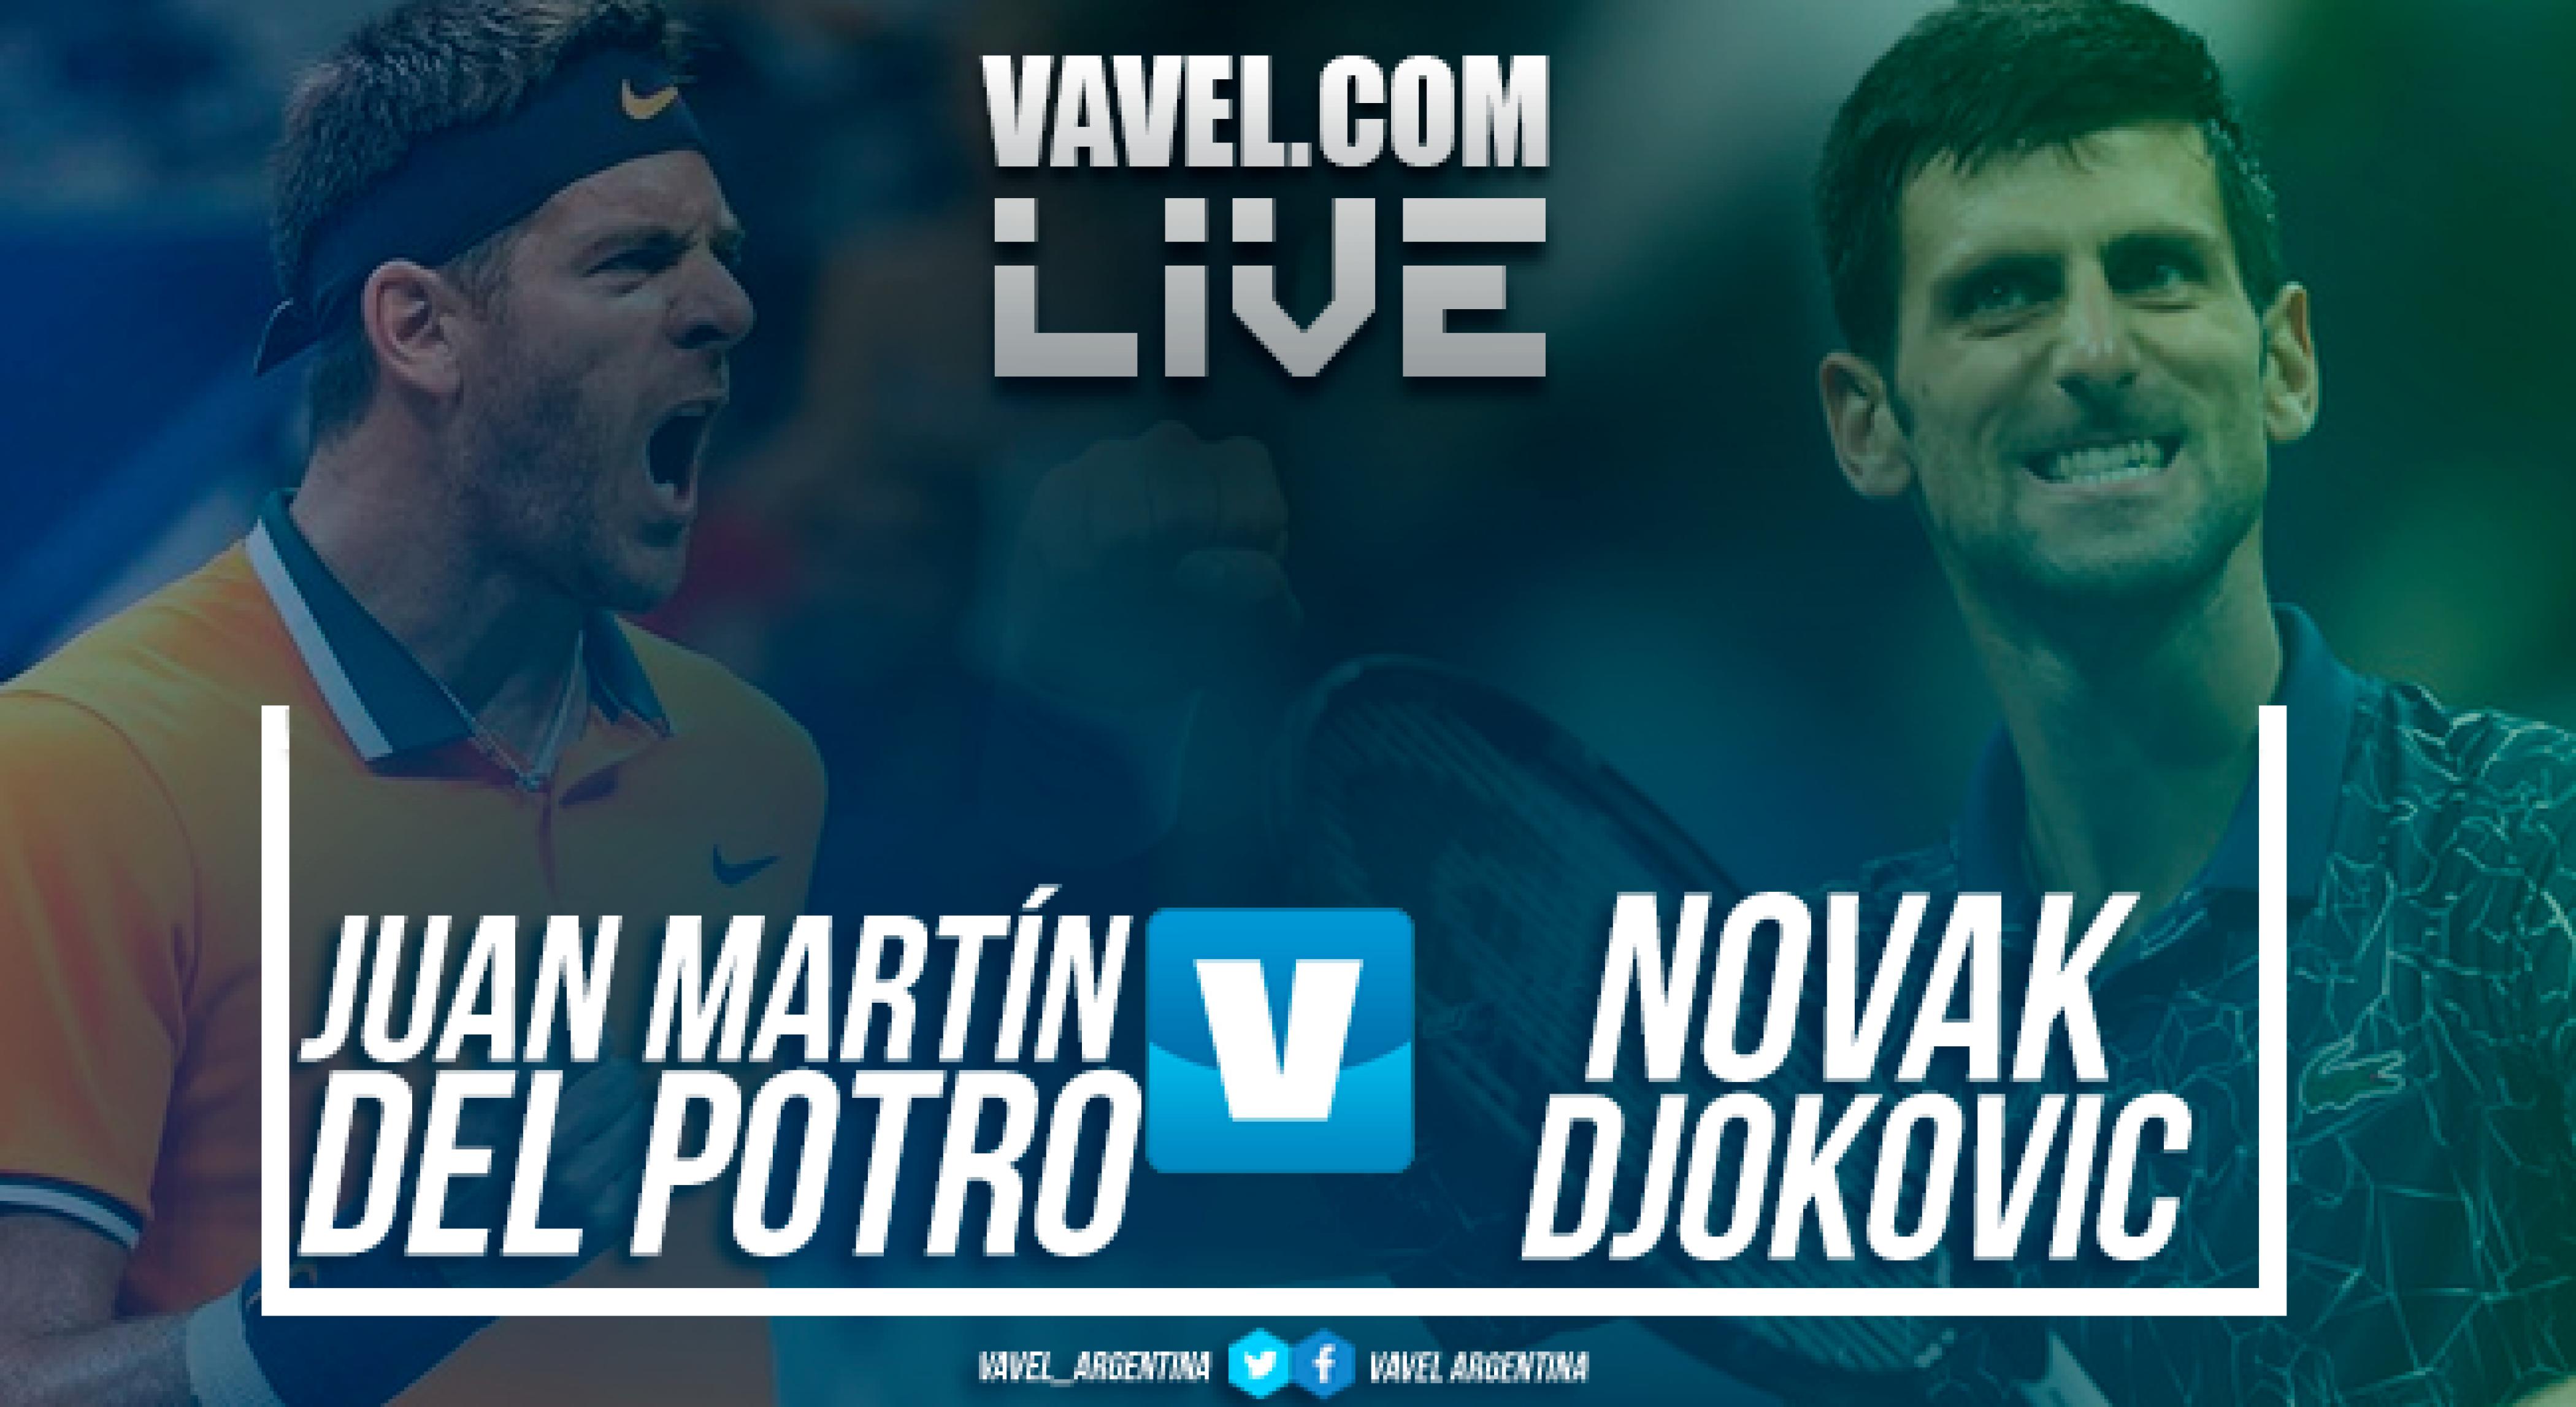 Resumen Del Potro vs Djokovic (3-6, 6-7 y 3-6)